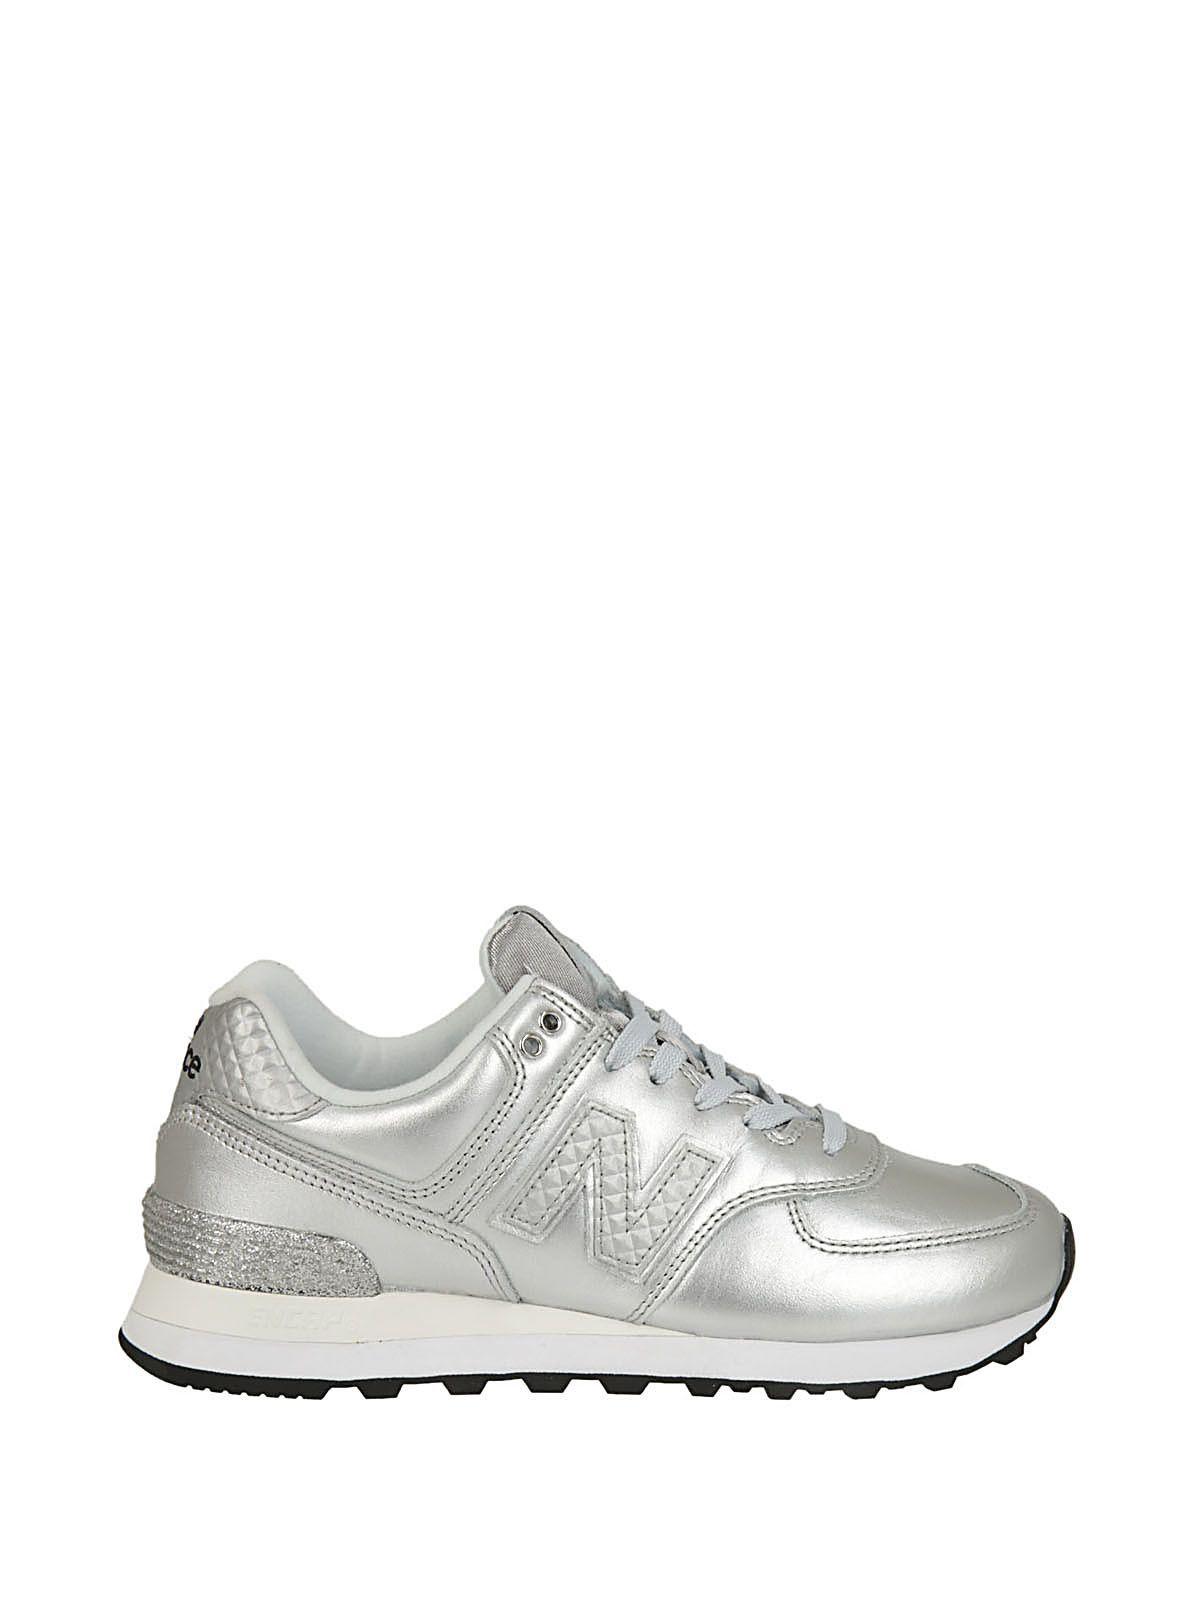 detailed look 7cb3b 8d7ab NEW BALANCE GLITTER PUNK SNEAKERS. #newbalance #shoes ...